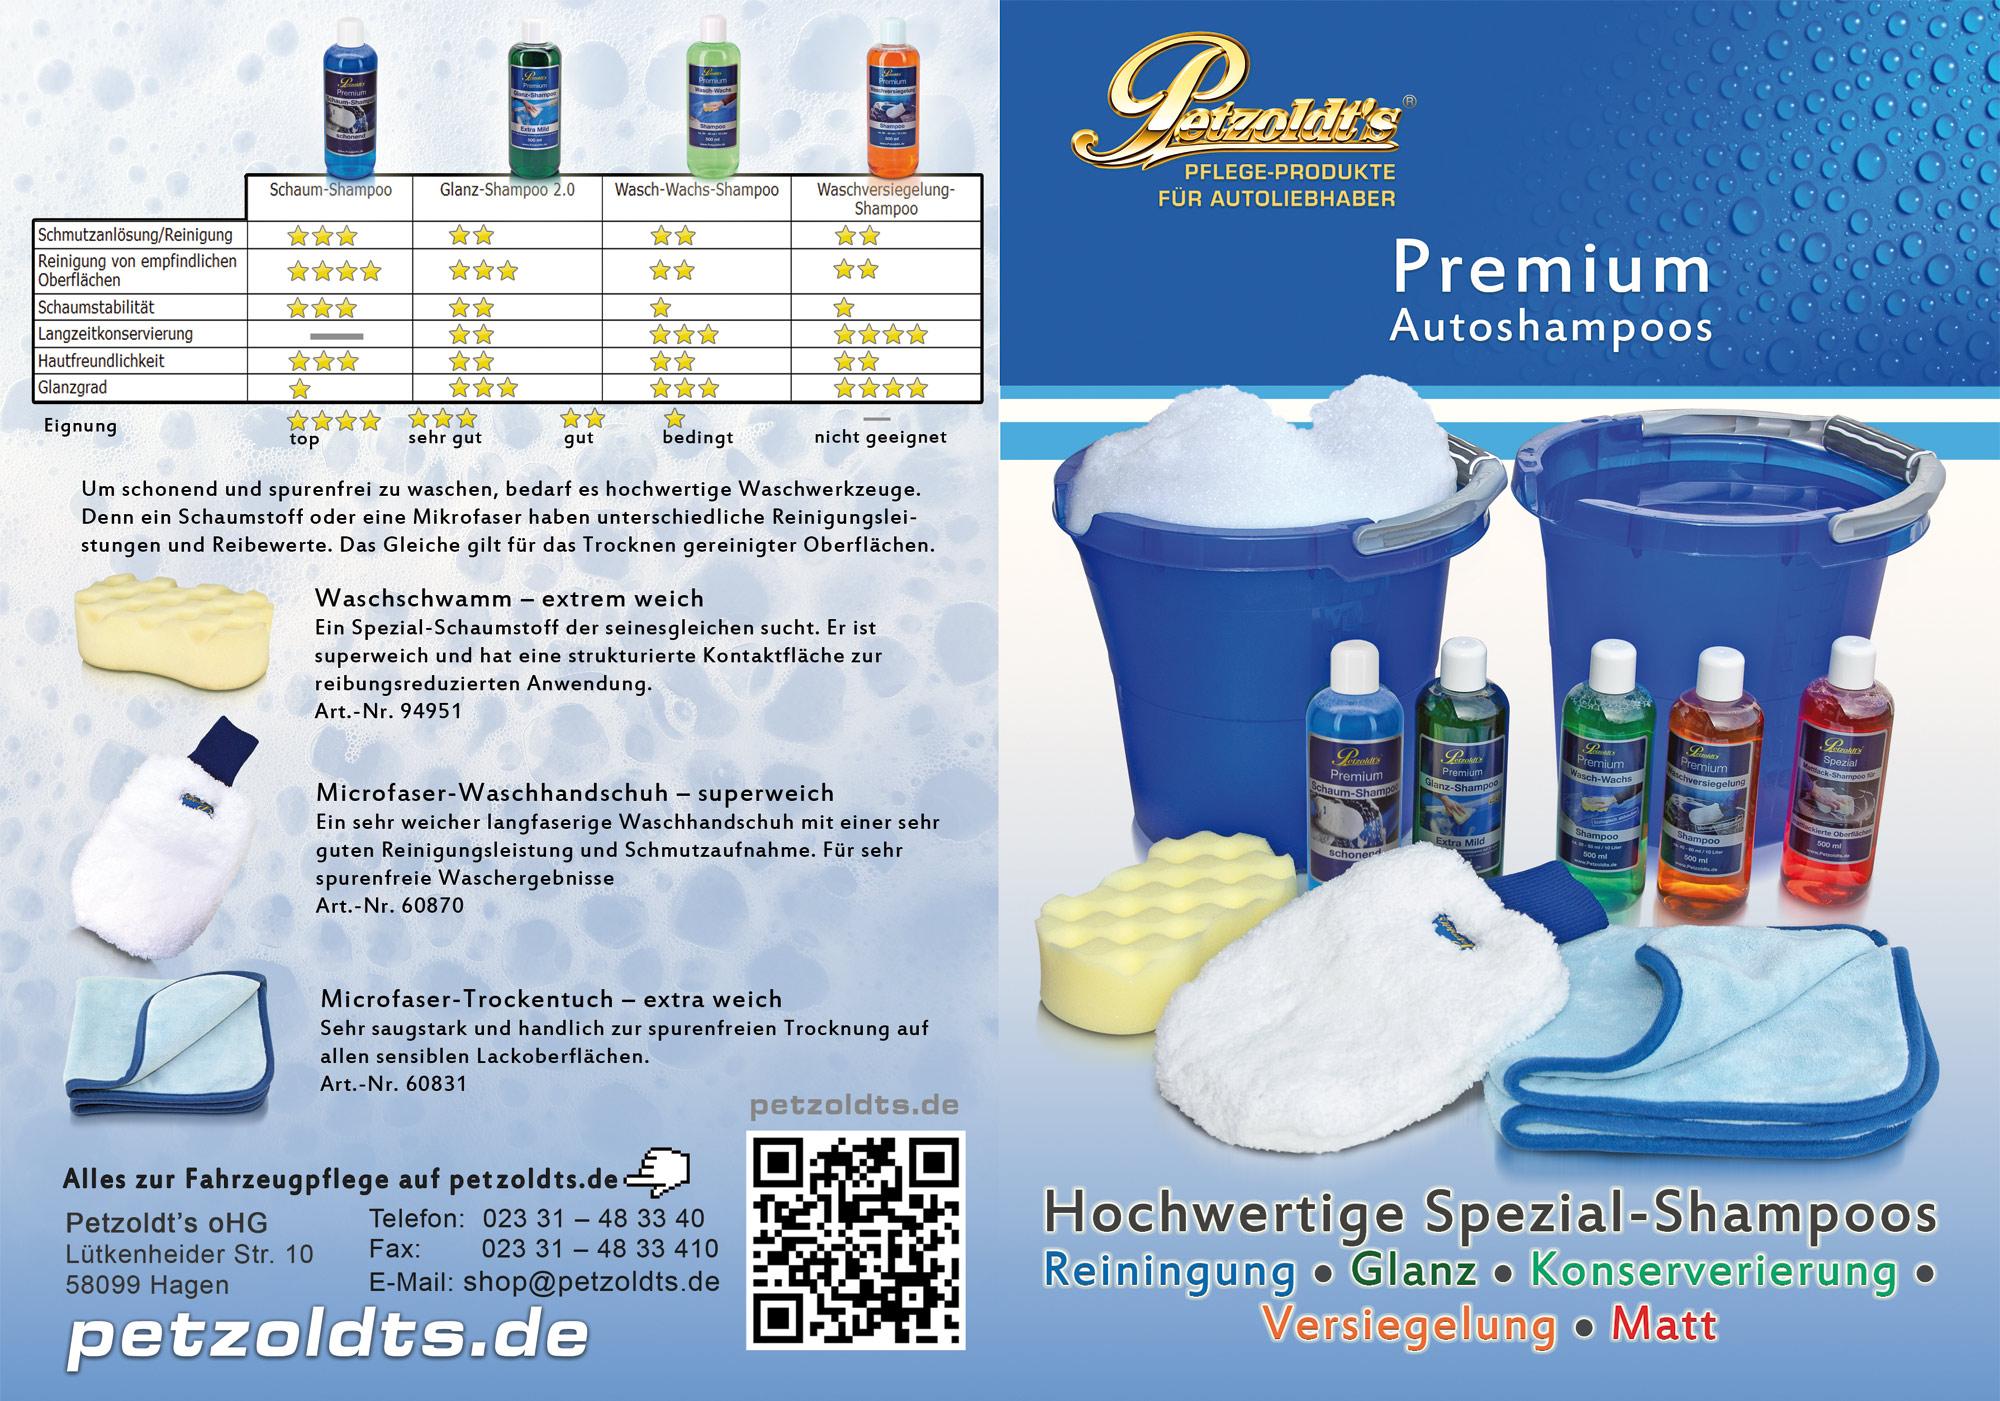 Petzoldts Schaum-Shampoo, zur lackschonenden Autowäsche